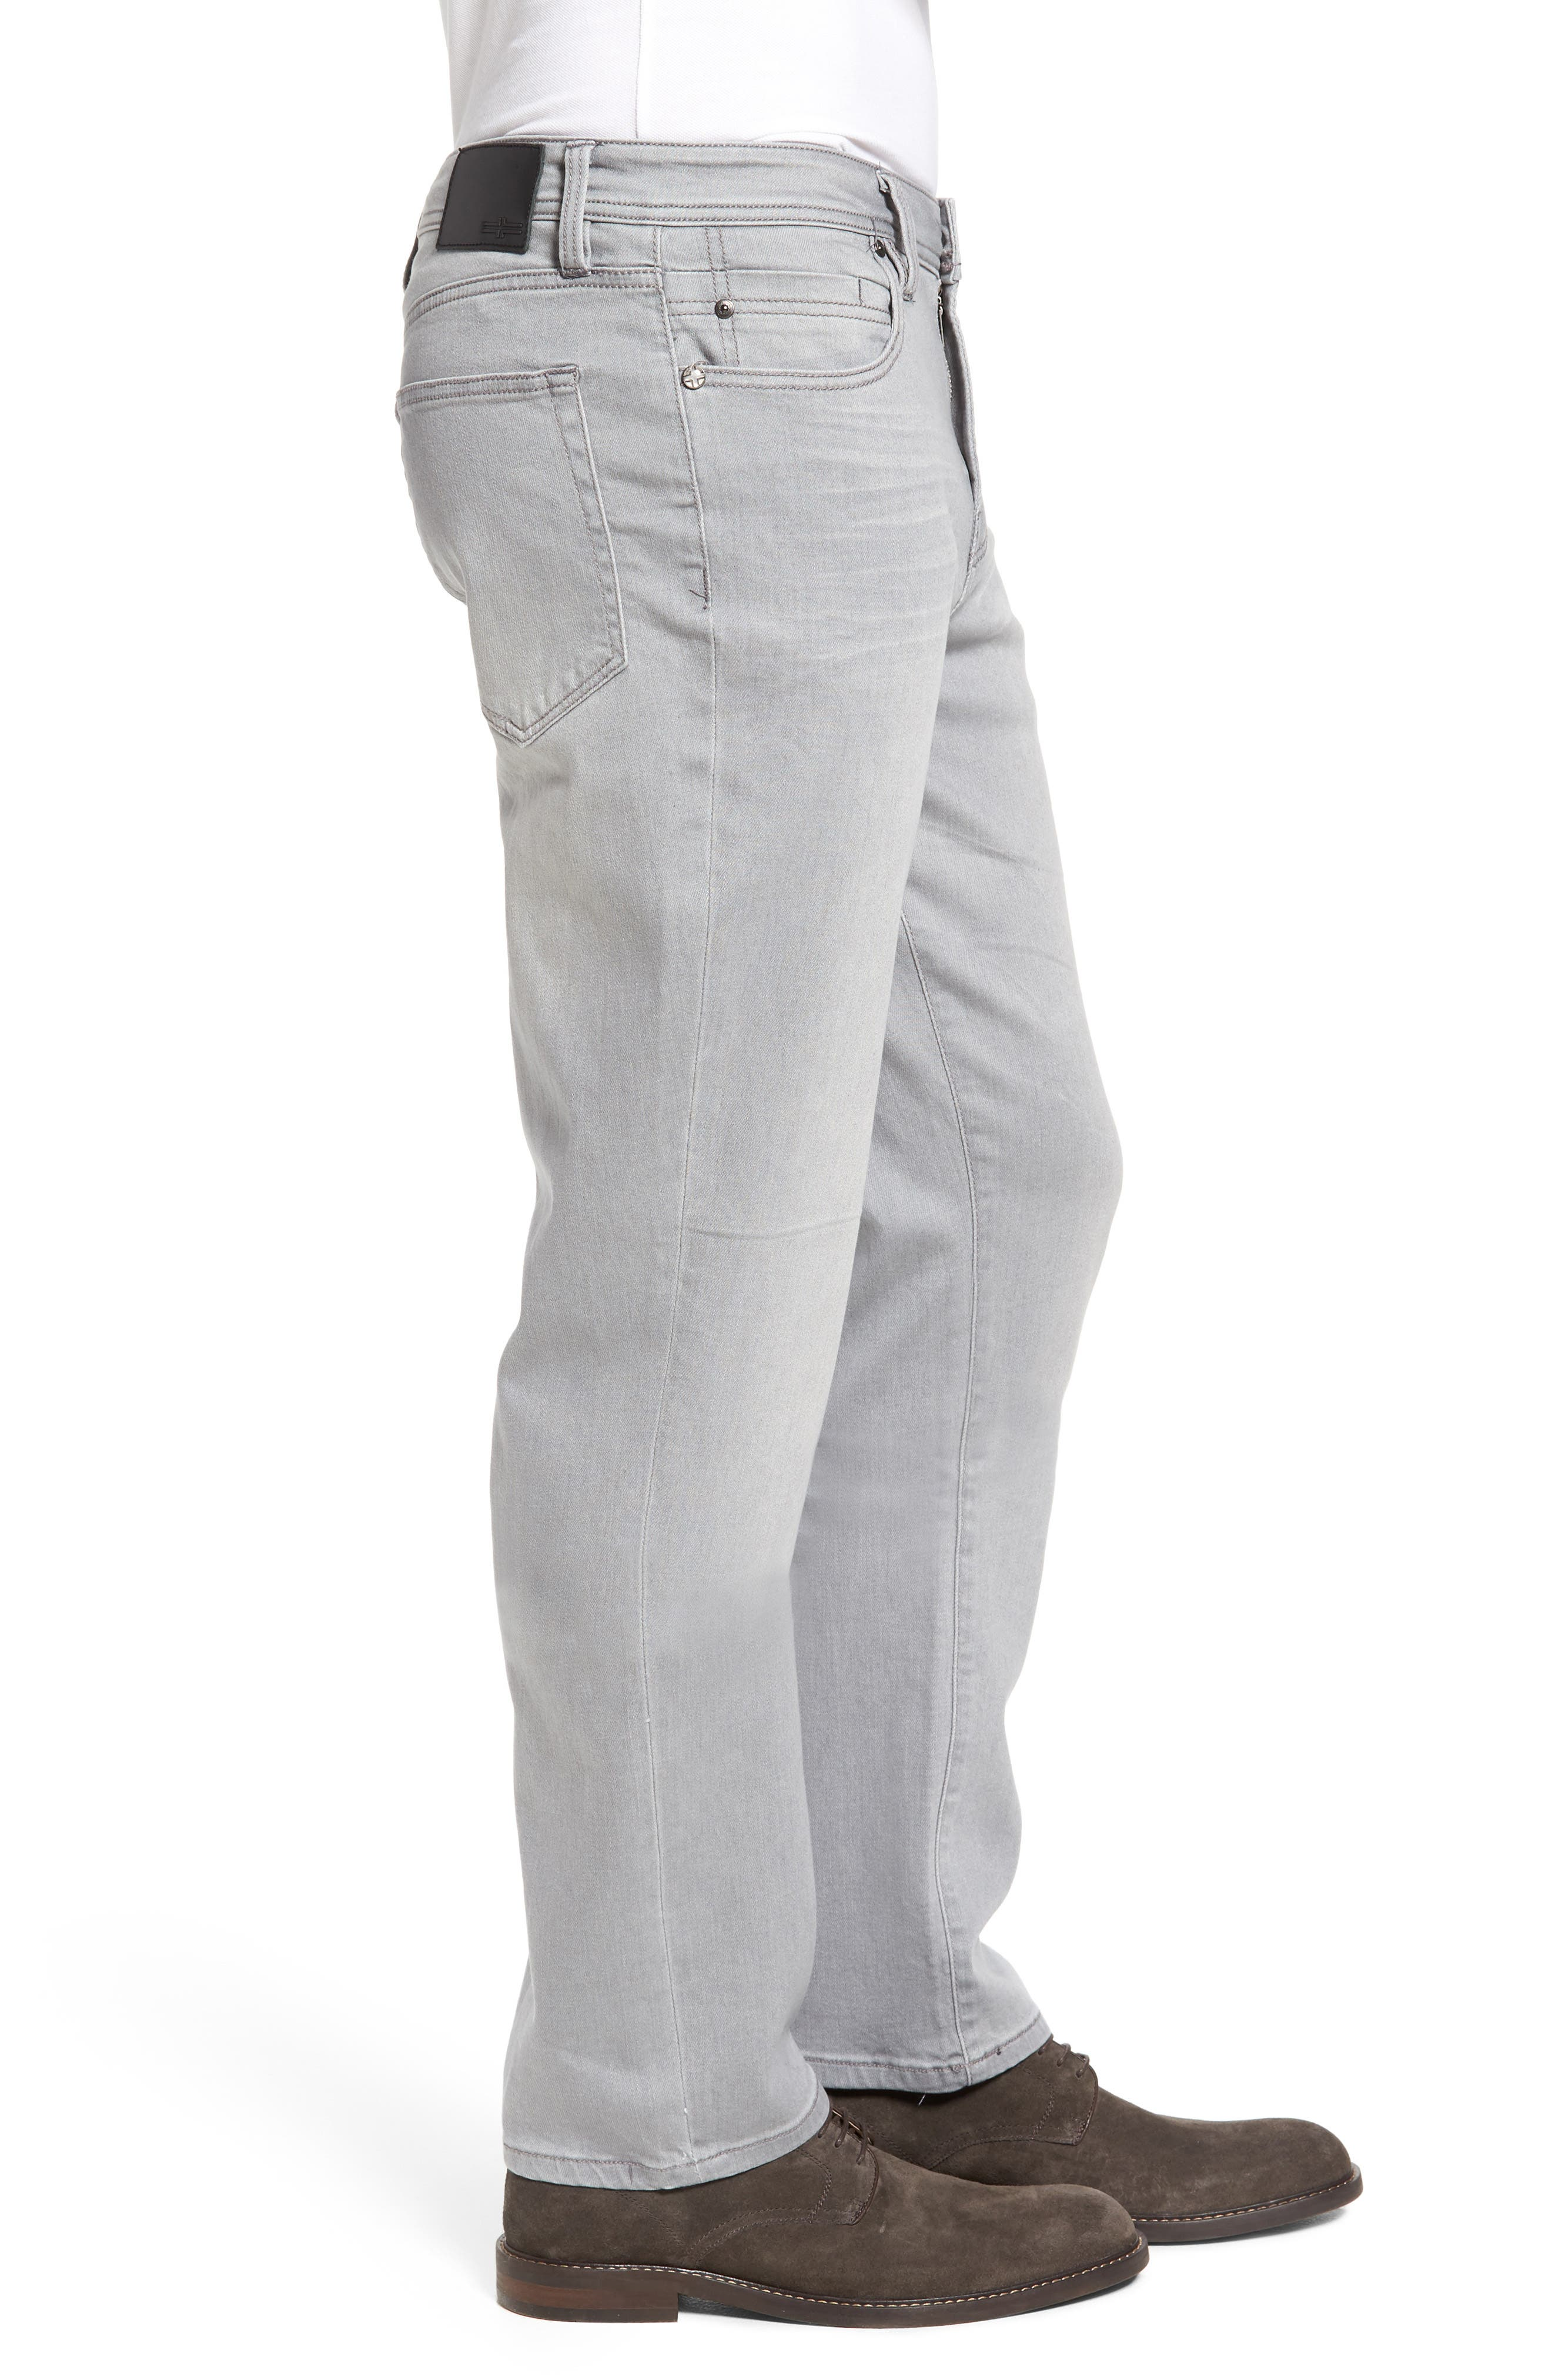 LIVERPOOL, Regent Relaxed Straight Leg Jeans, Alternate thumbnail 3, color, COAL MINE DARK